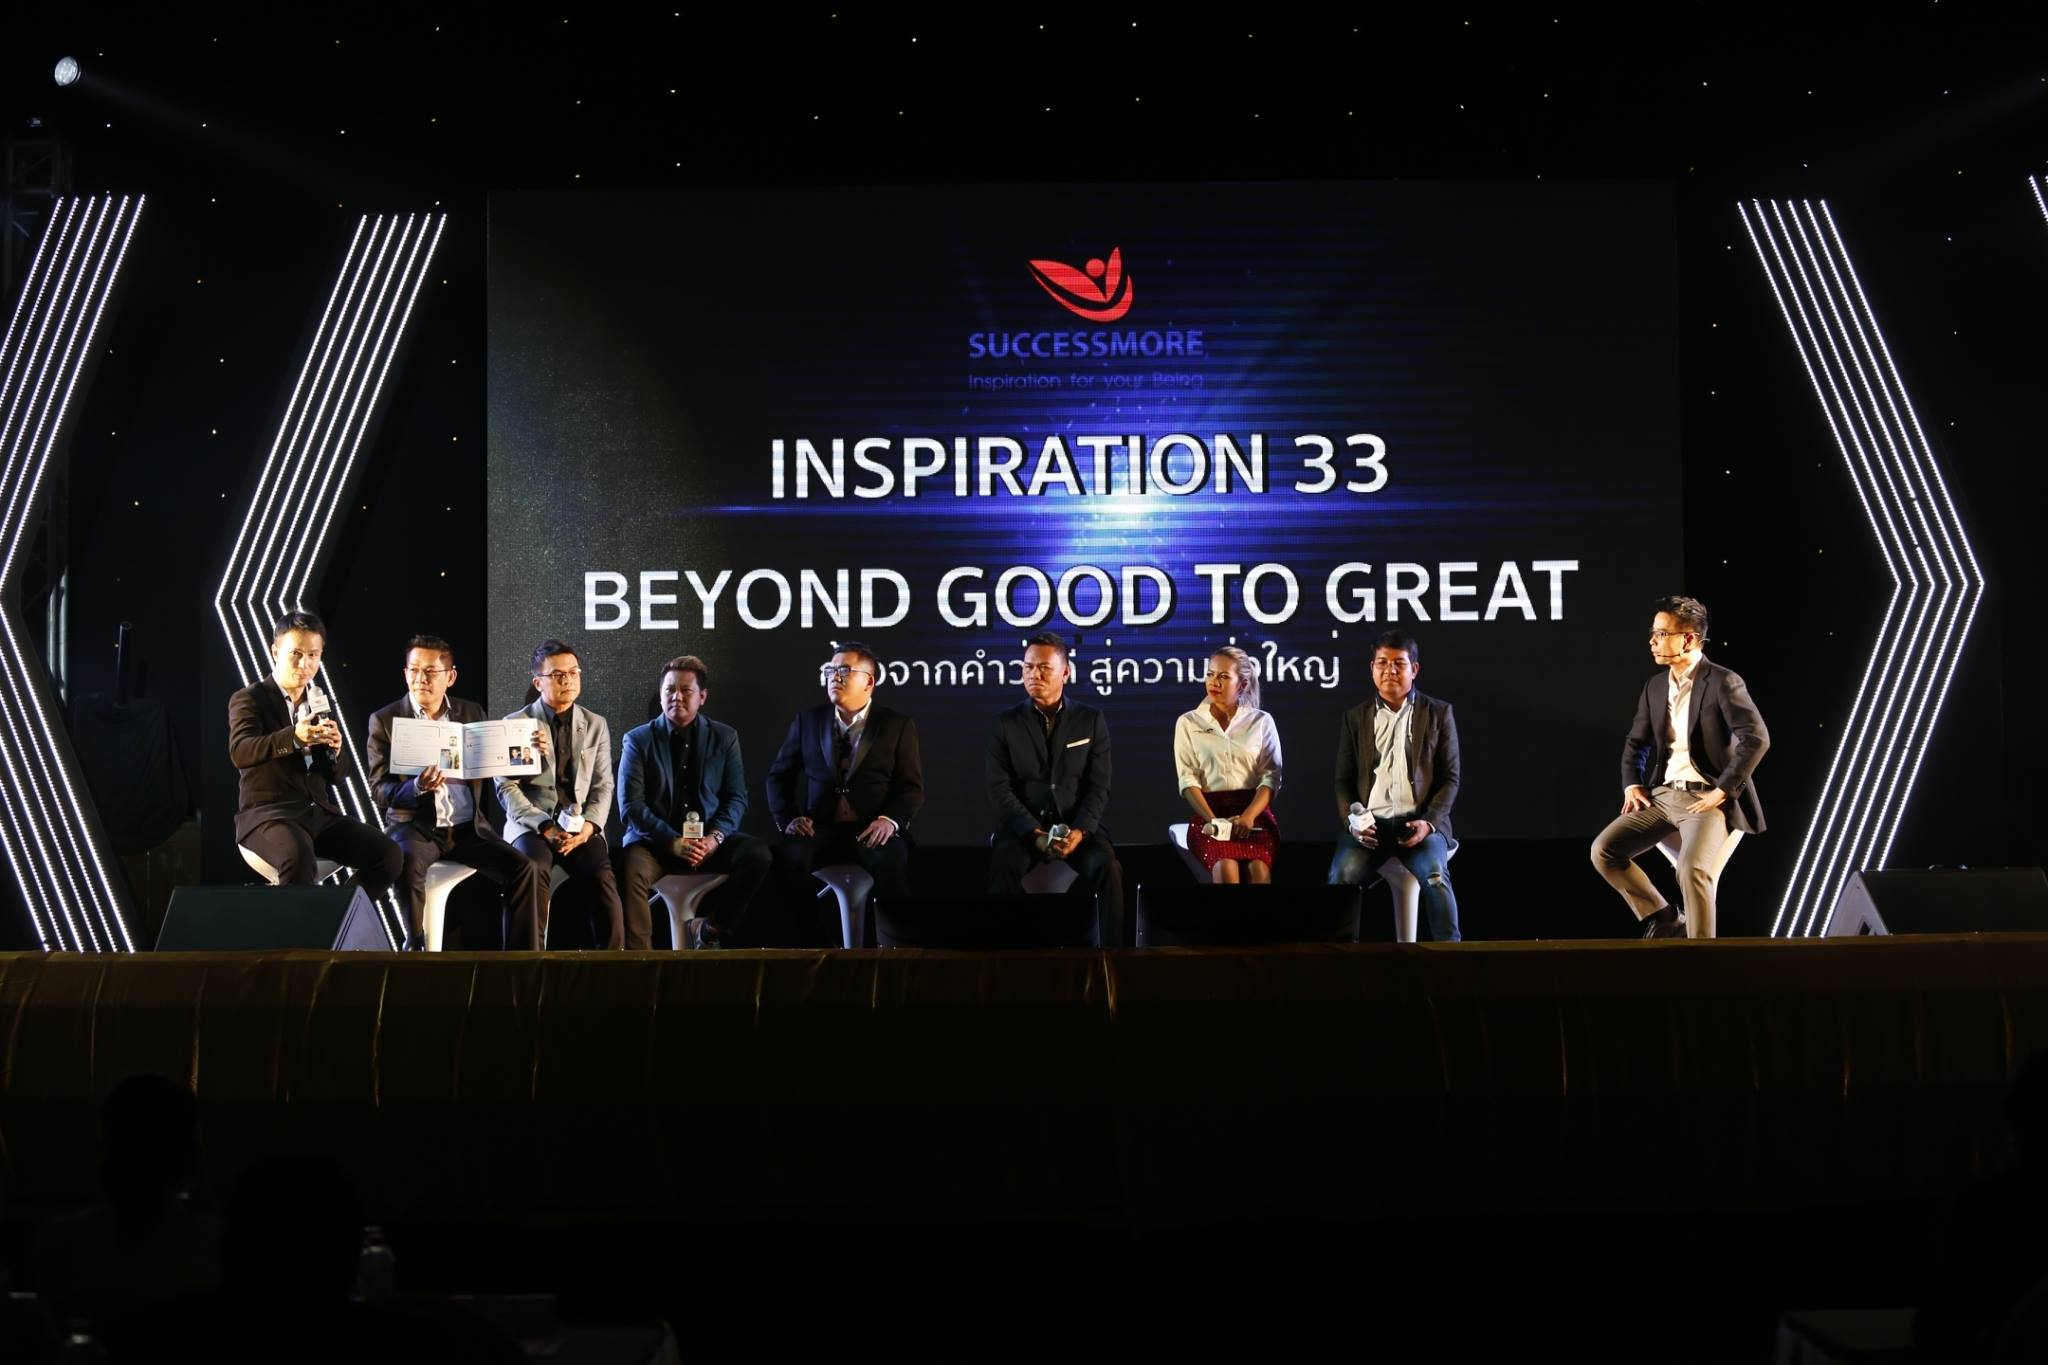 SUCCESSMORE Inspiration ครั้งที่ 33 (7)